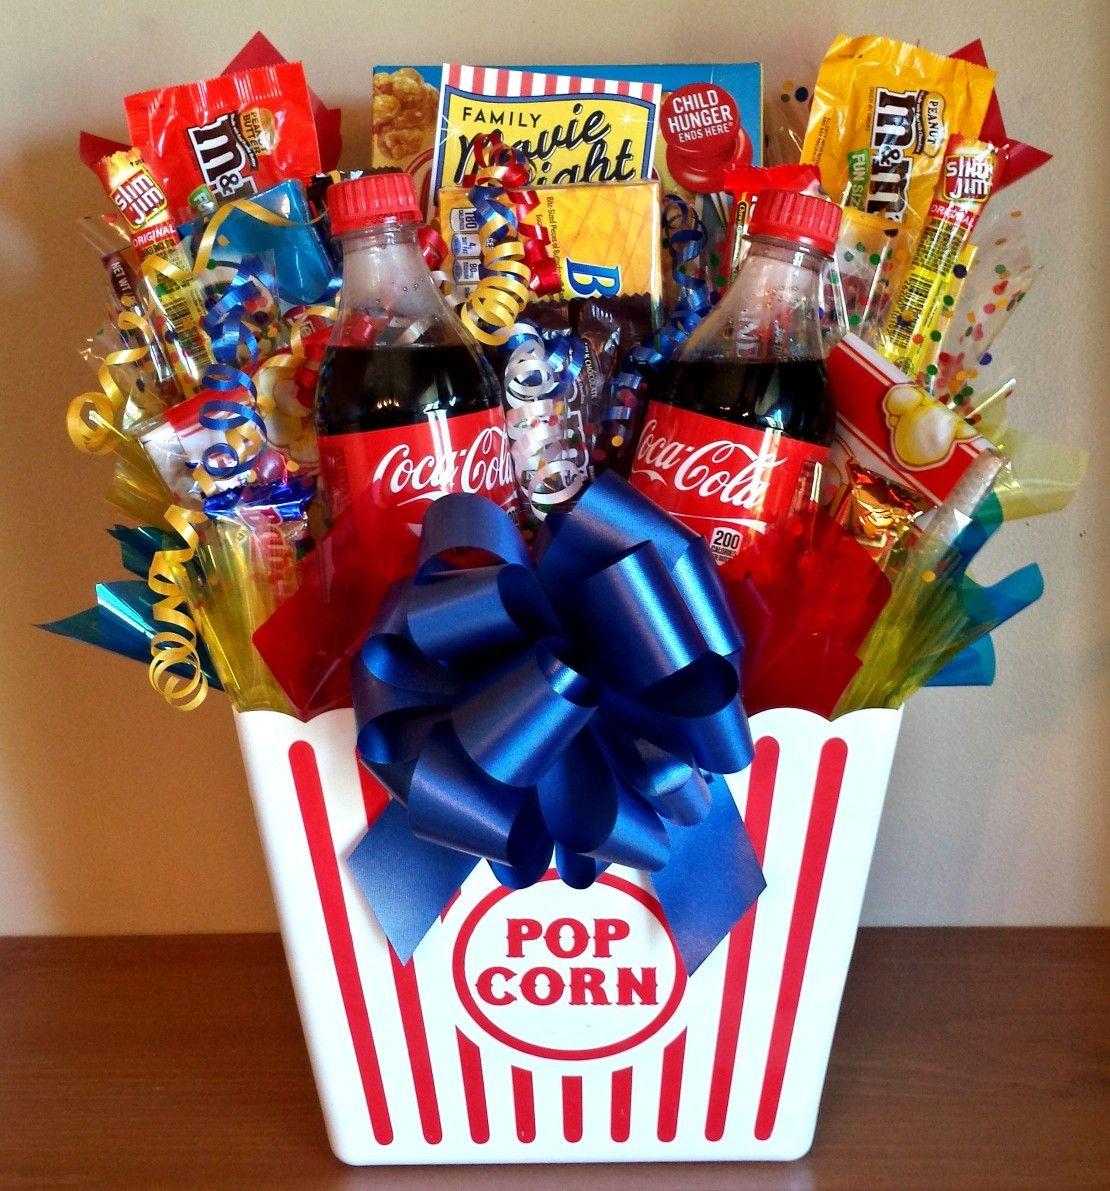 Movie Night Gift Box Giftidea Movielover Birthday Christmas Secretsanta Forlance Forlinda Movie Basket Gift Homemade Gift Baskets Christmas Gift Baskets